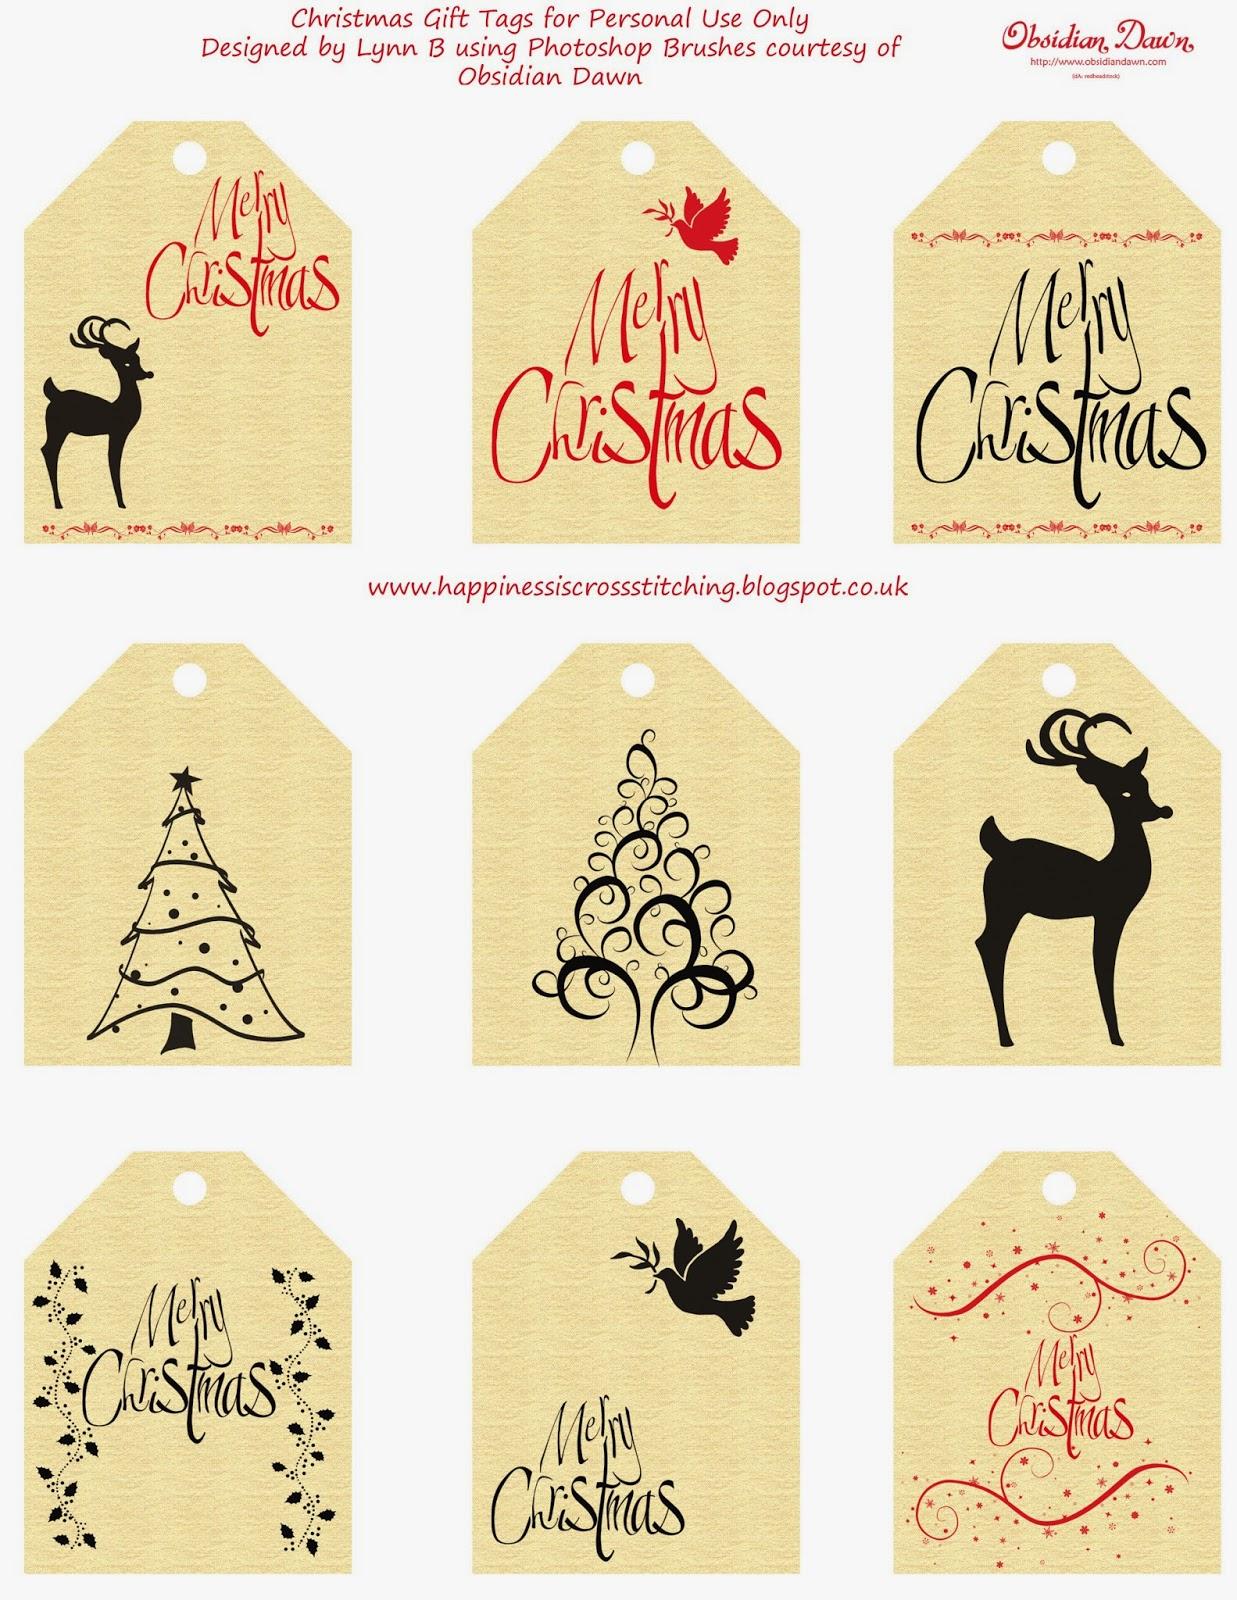 Christmas Gift Tags By Lynn B